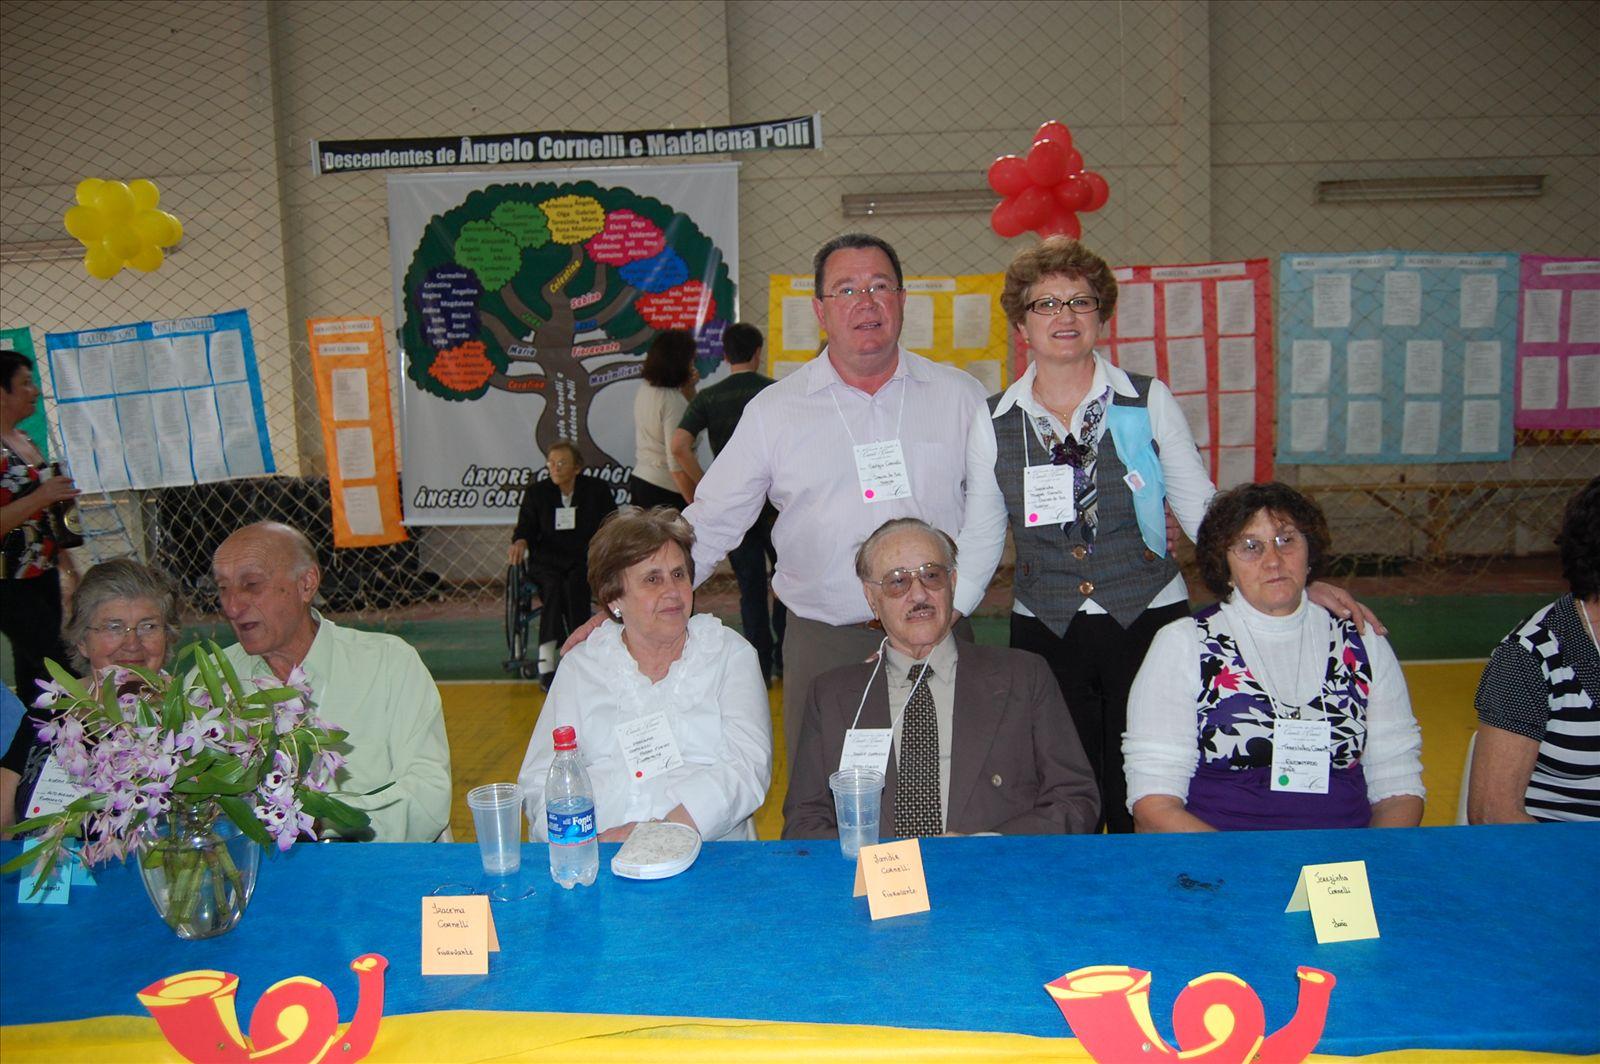 2º Encontro Família Cornelli - 11.10.2009 (215)_0